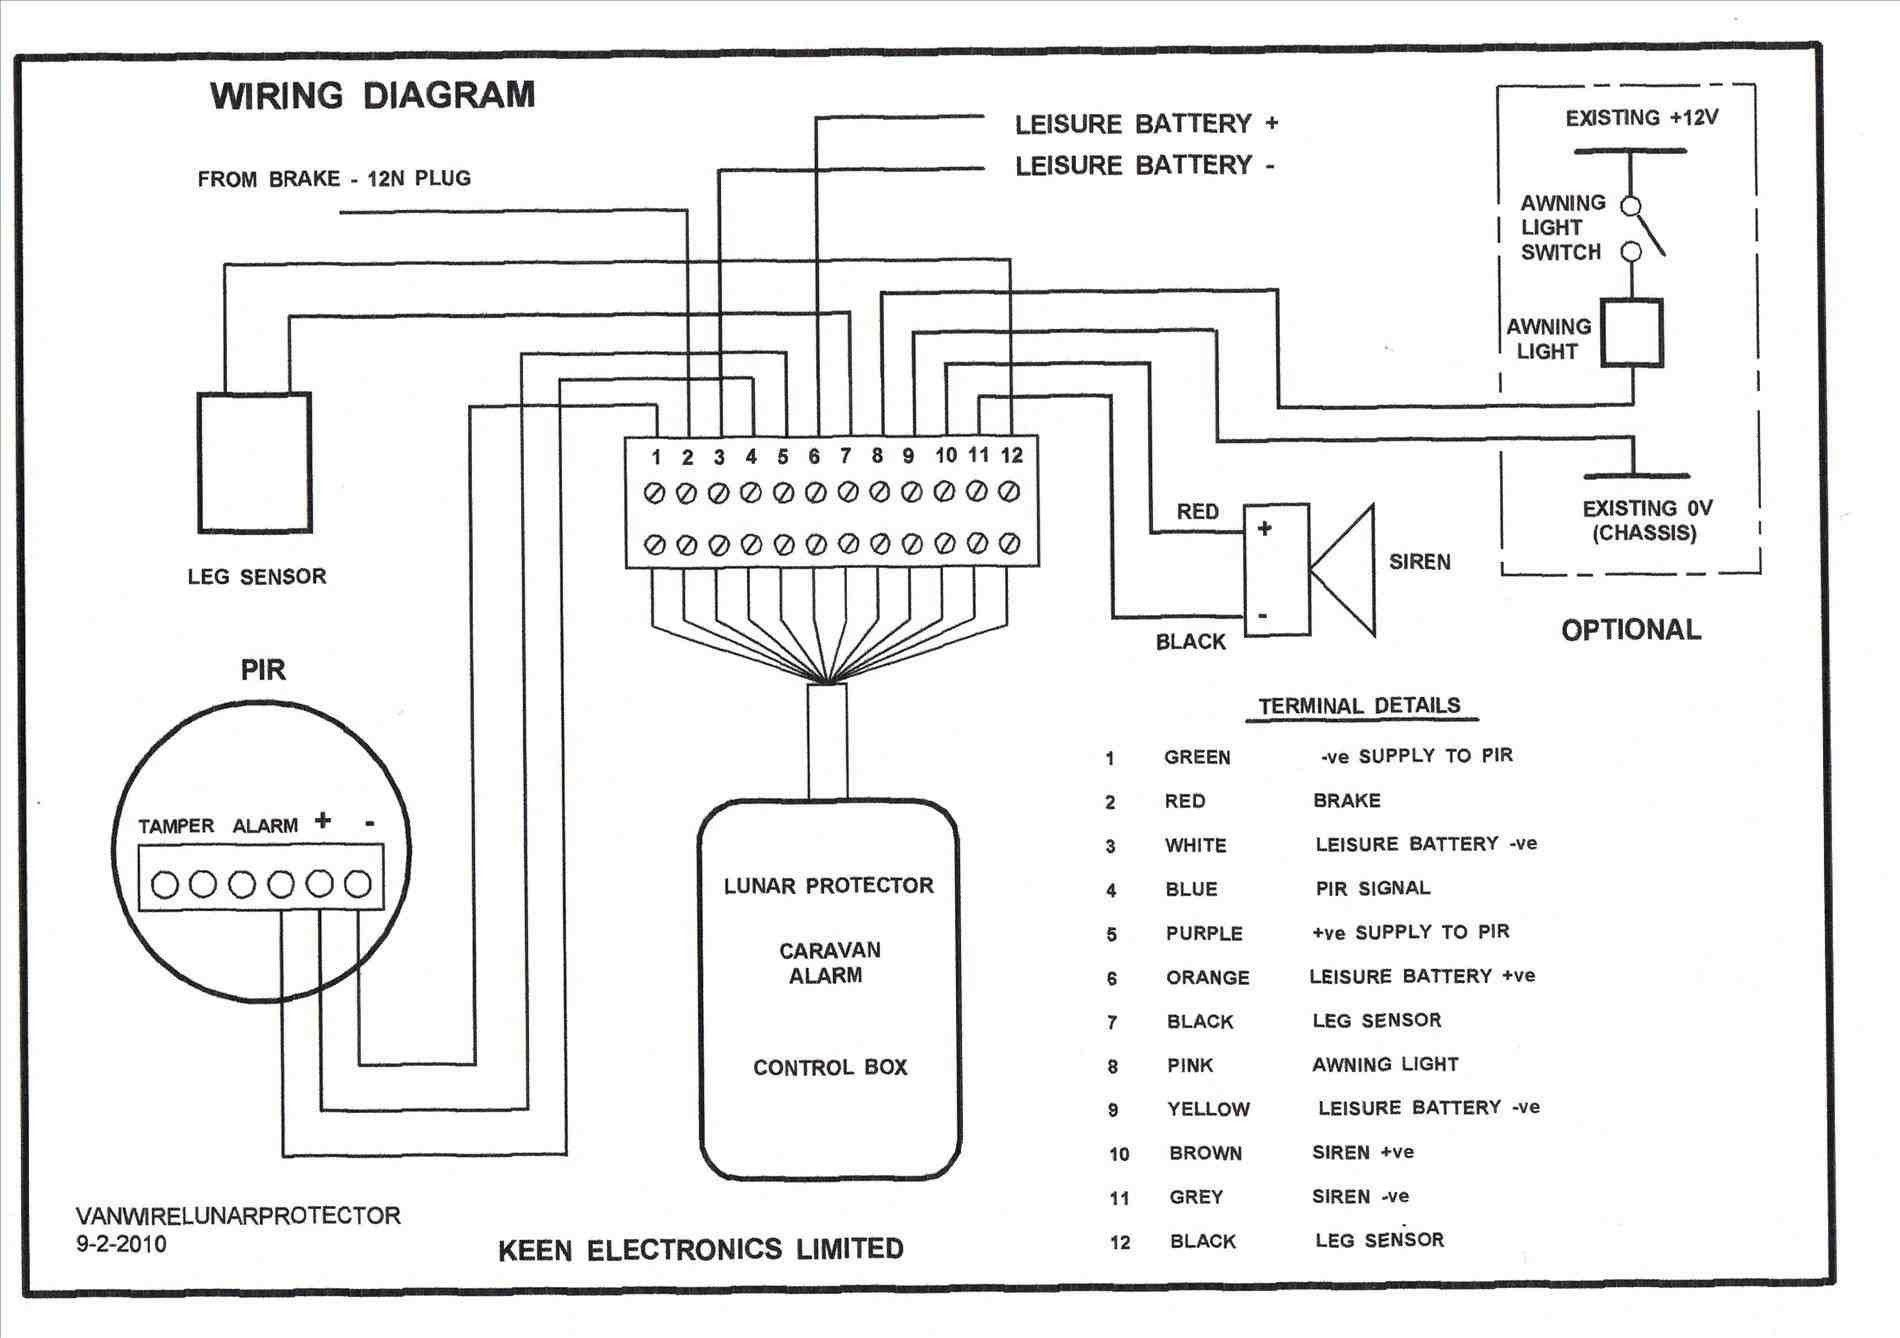 Brake Wiring Diagram Pin by Brid Webster On Diagram Chart In 2019 Of Brake Wiring Diagram